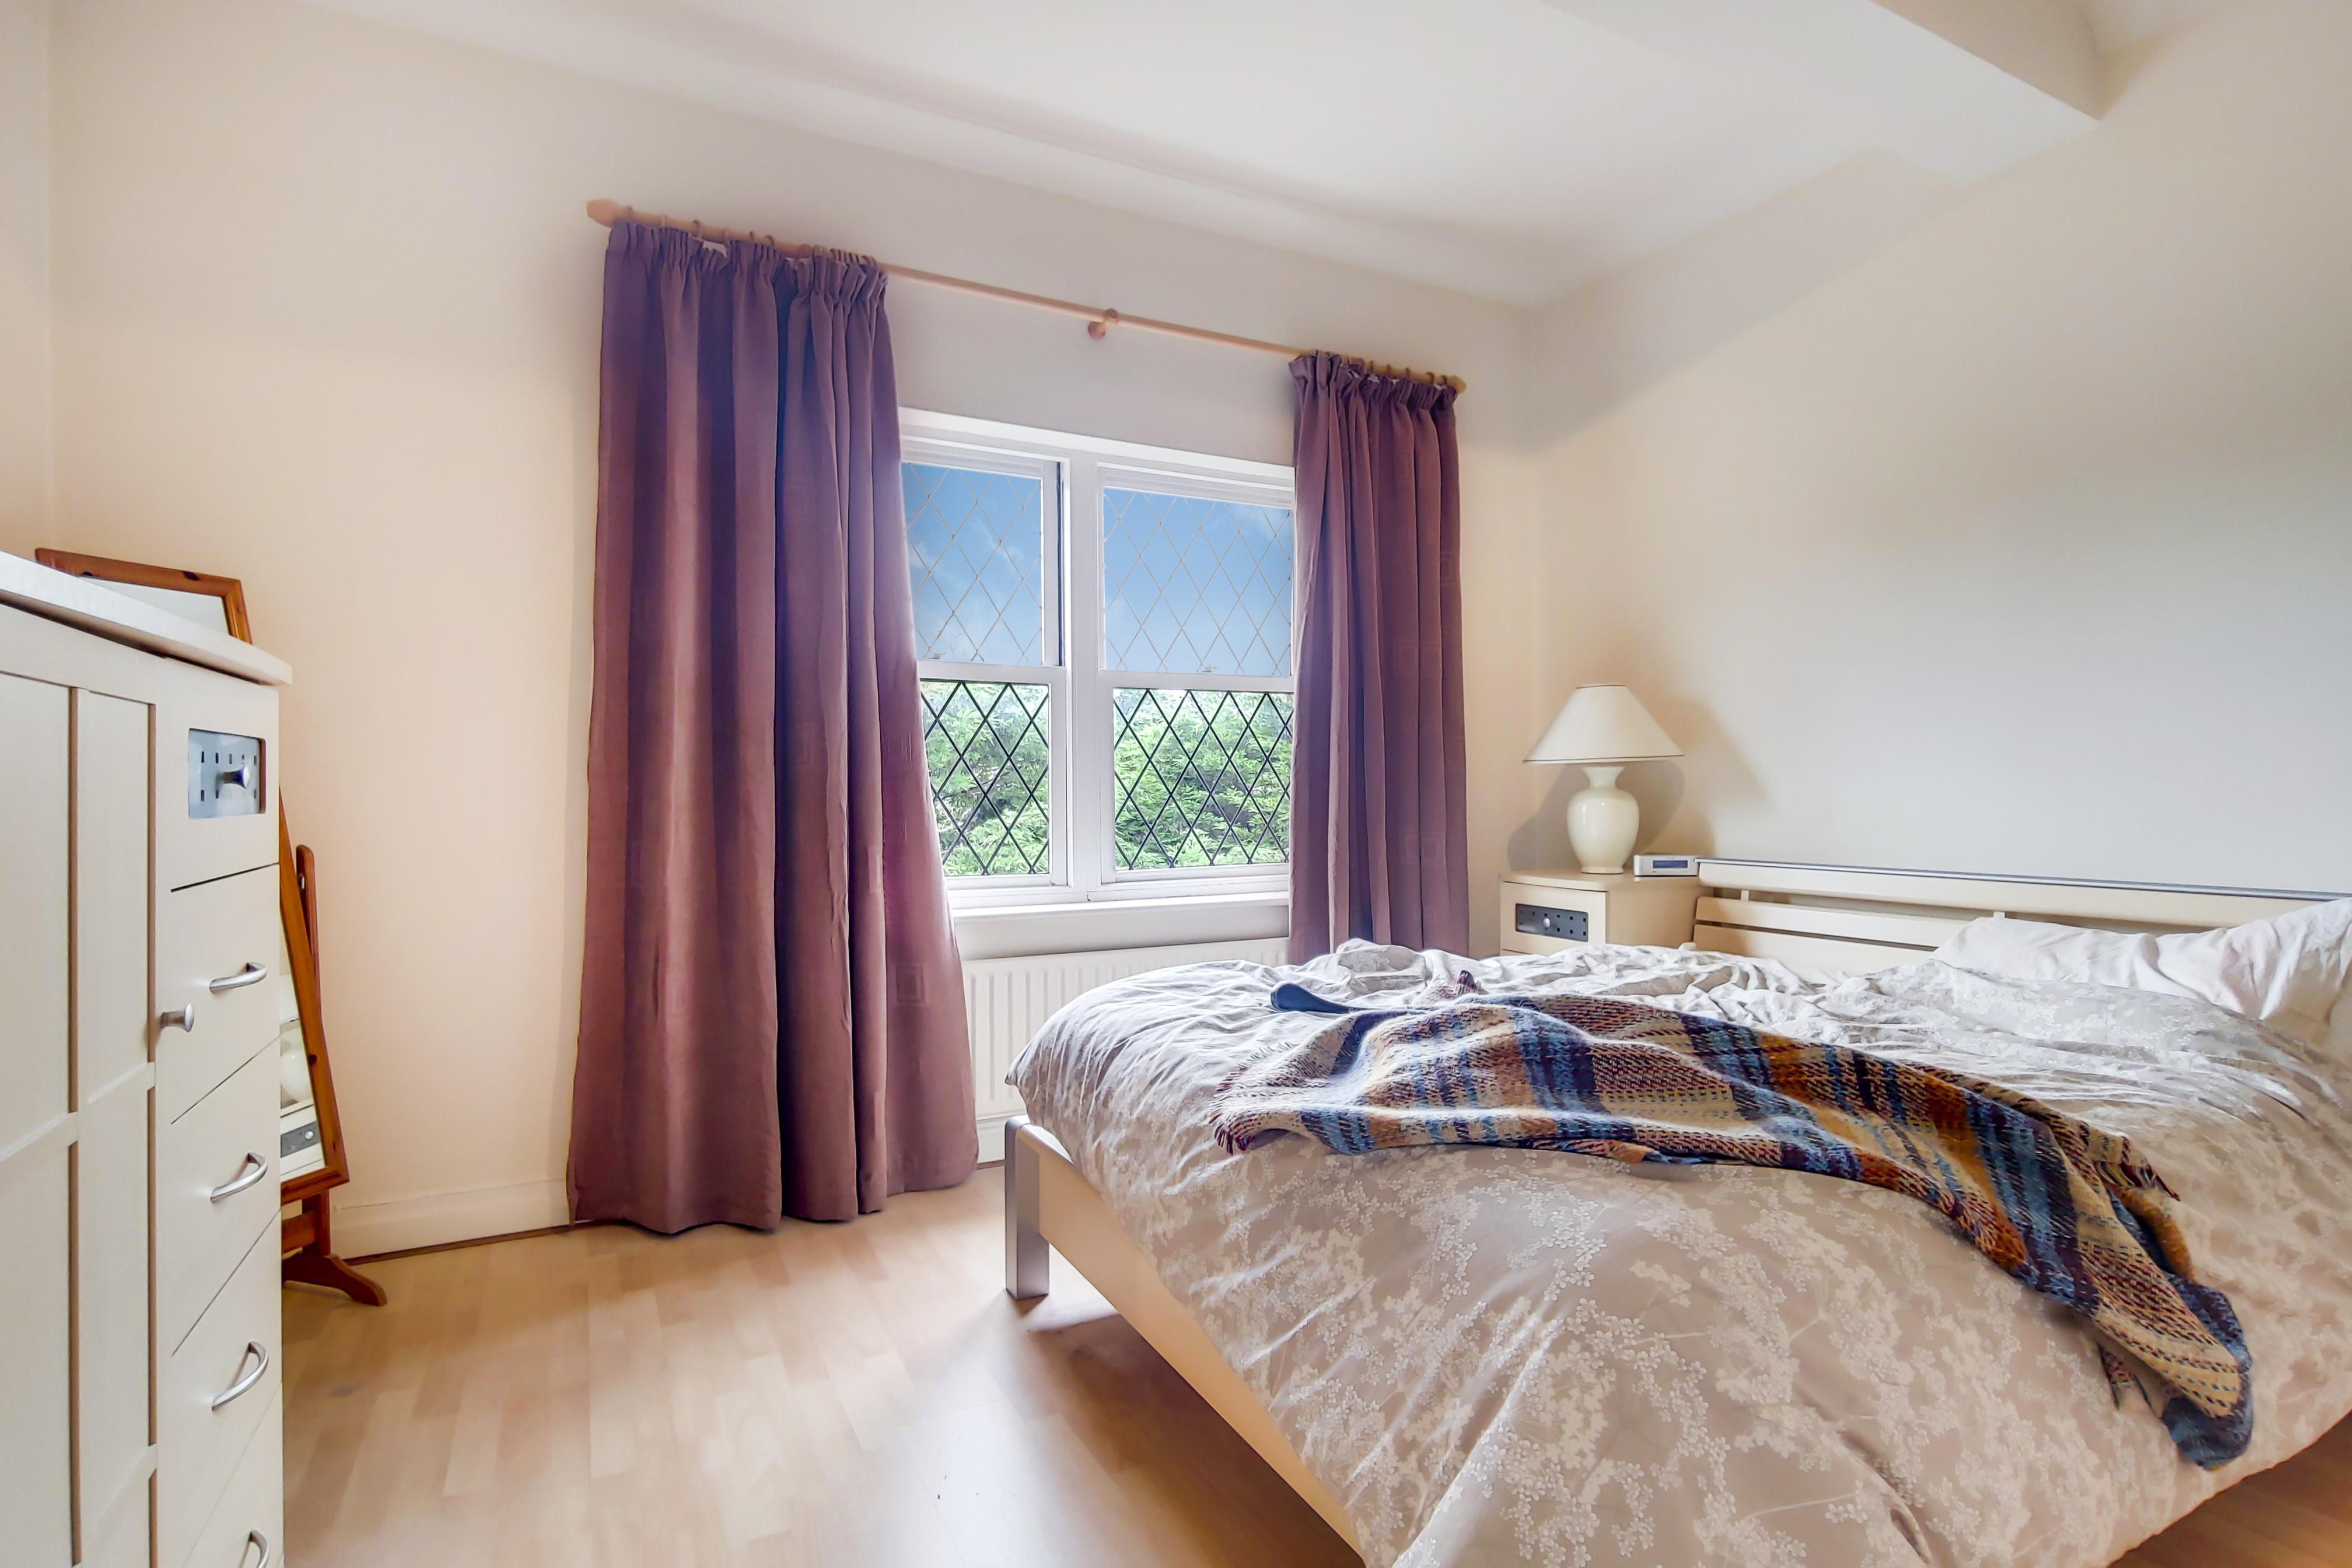 customer_1/branch_2/client_43164/sale_property/4_Bedroom_1_1592320500.jpeg